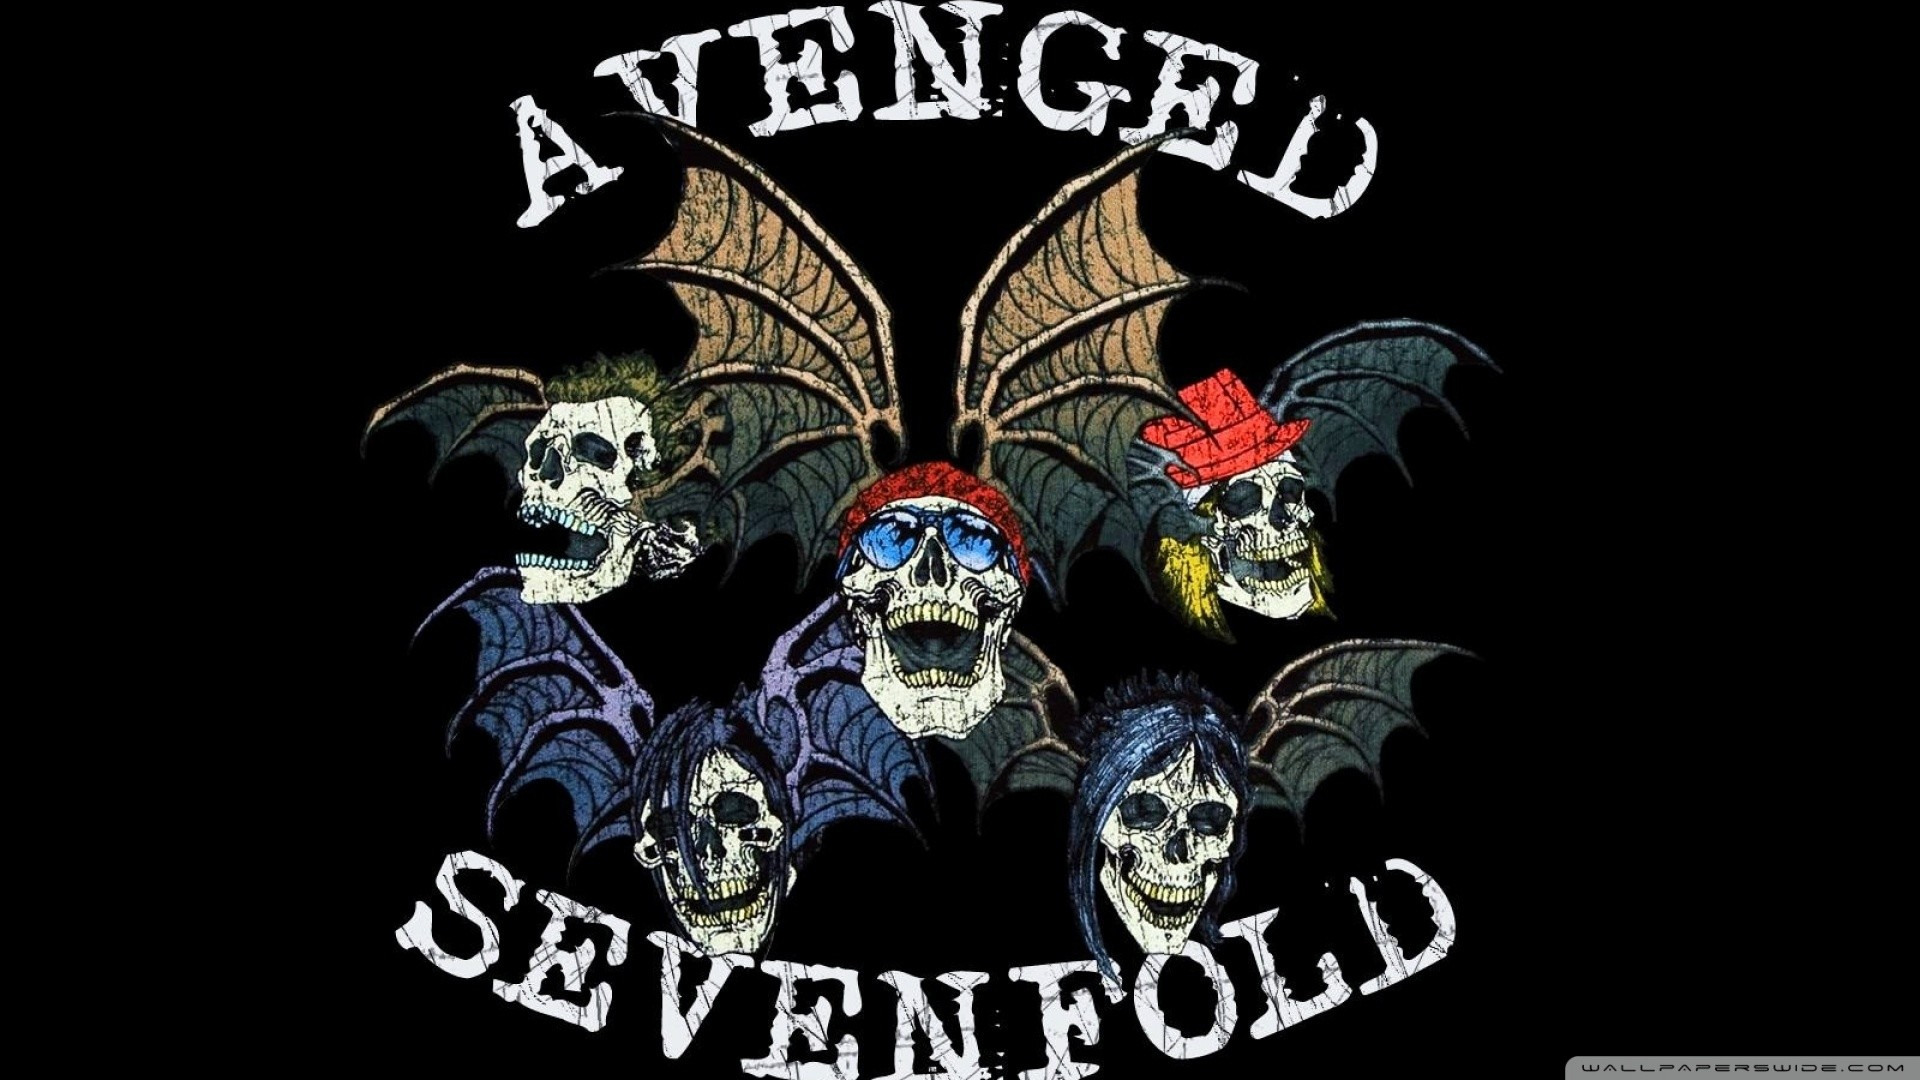 … Avenged Sevenfold Logo HD desktop wallpaper : Widescreen : High … Avenged  Sevenfold Logo HD desktop wallpaper : Widescreen : High .